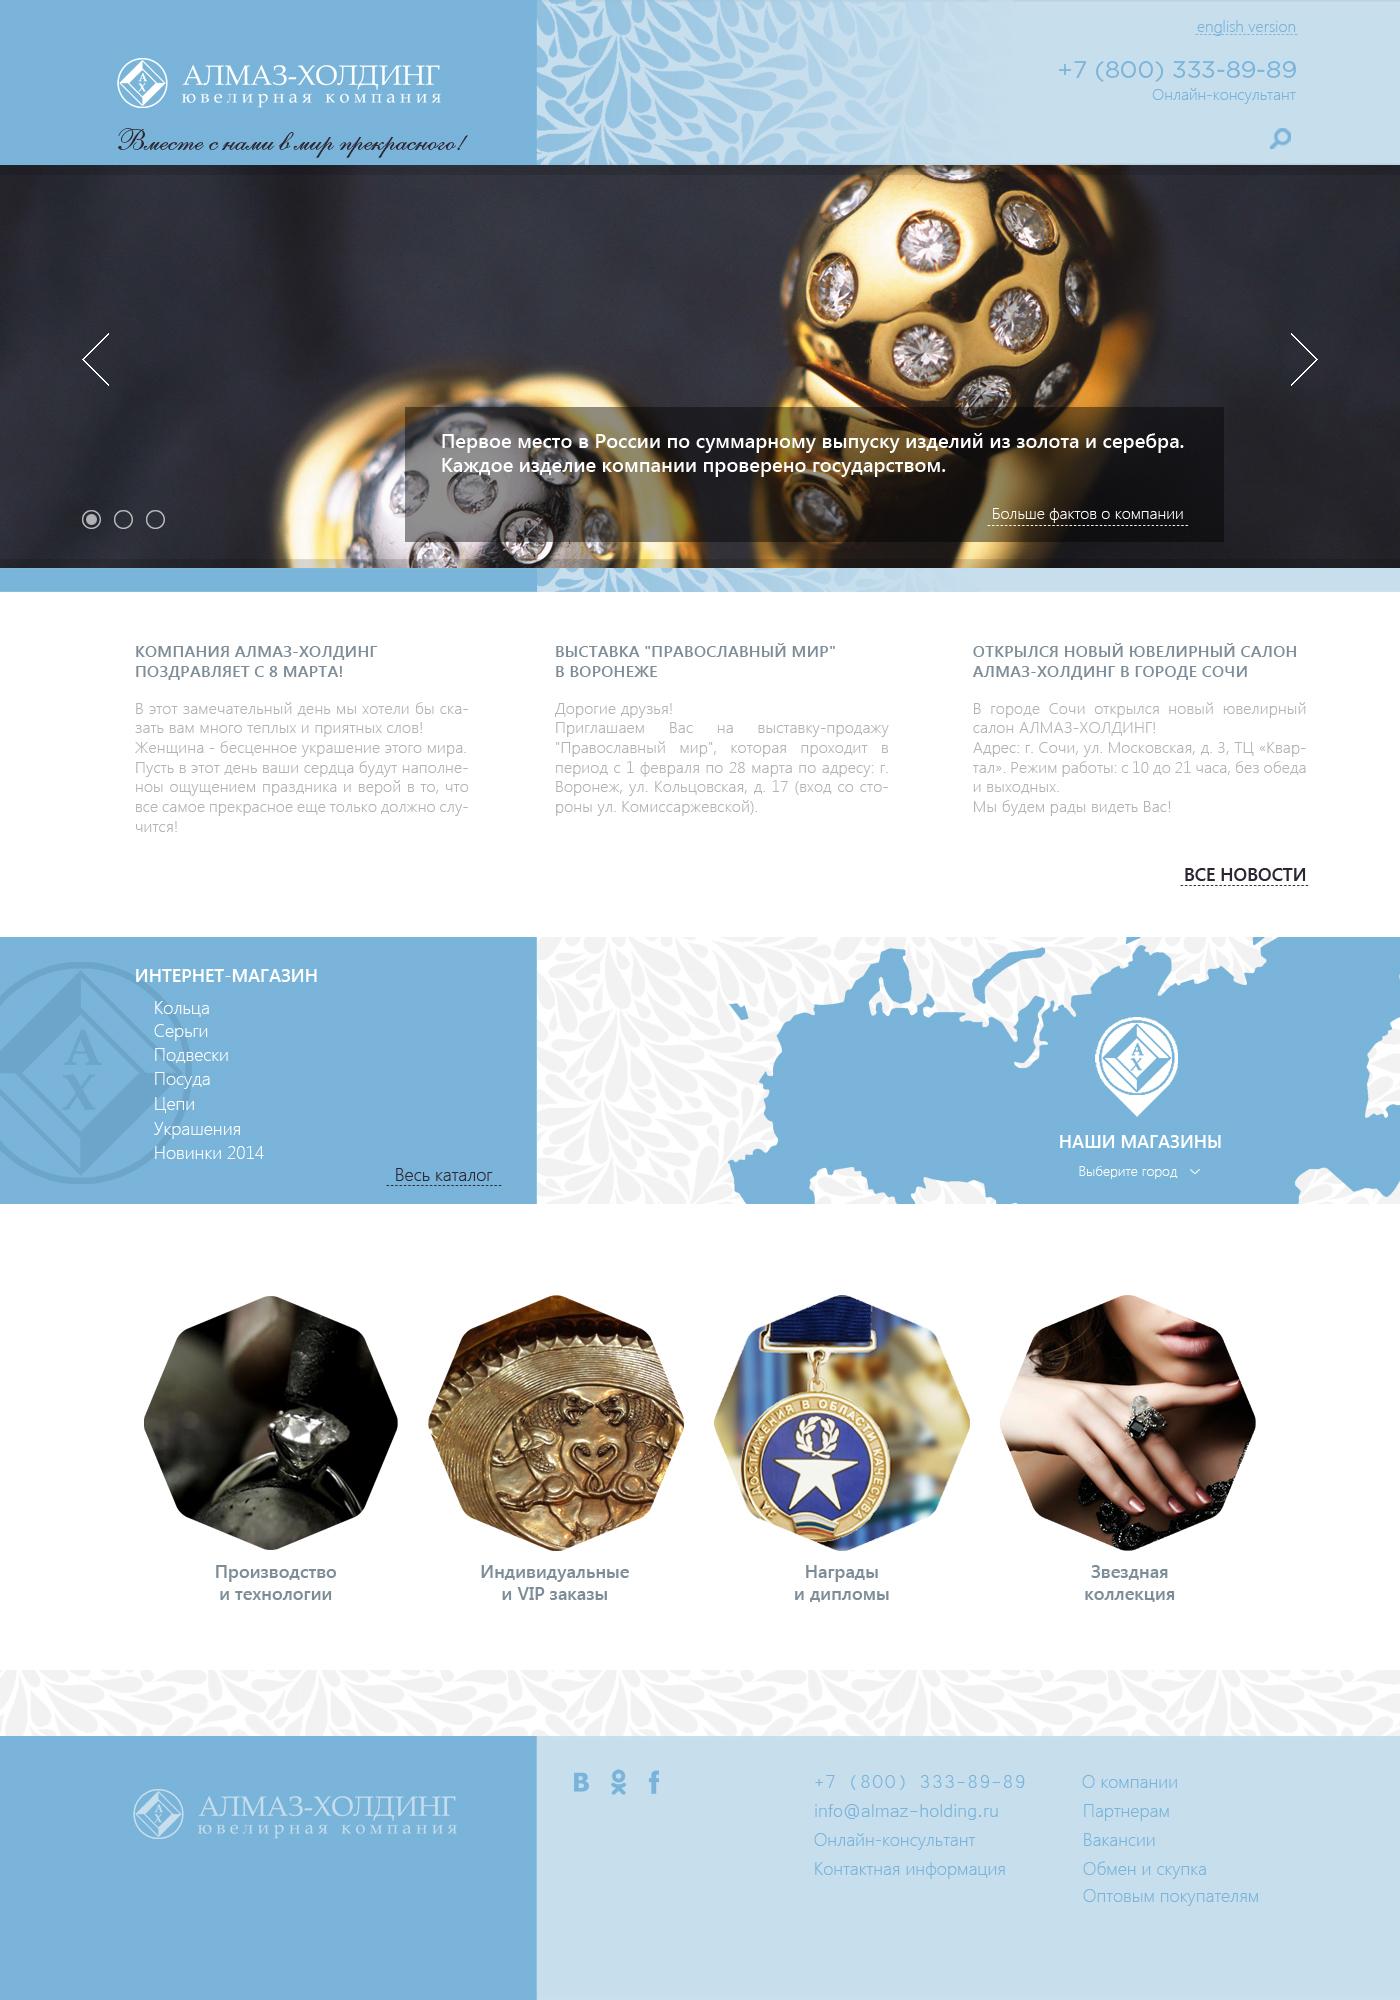 Дизайн сайта для ювелирной компании Алмаз-Холдинг фото f_595531f5a73b72b7.jpg